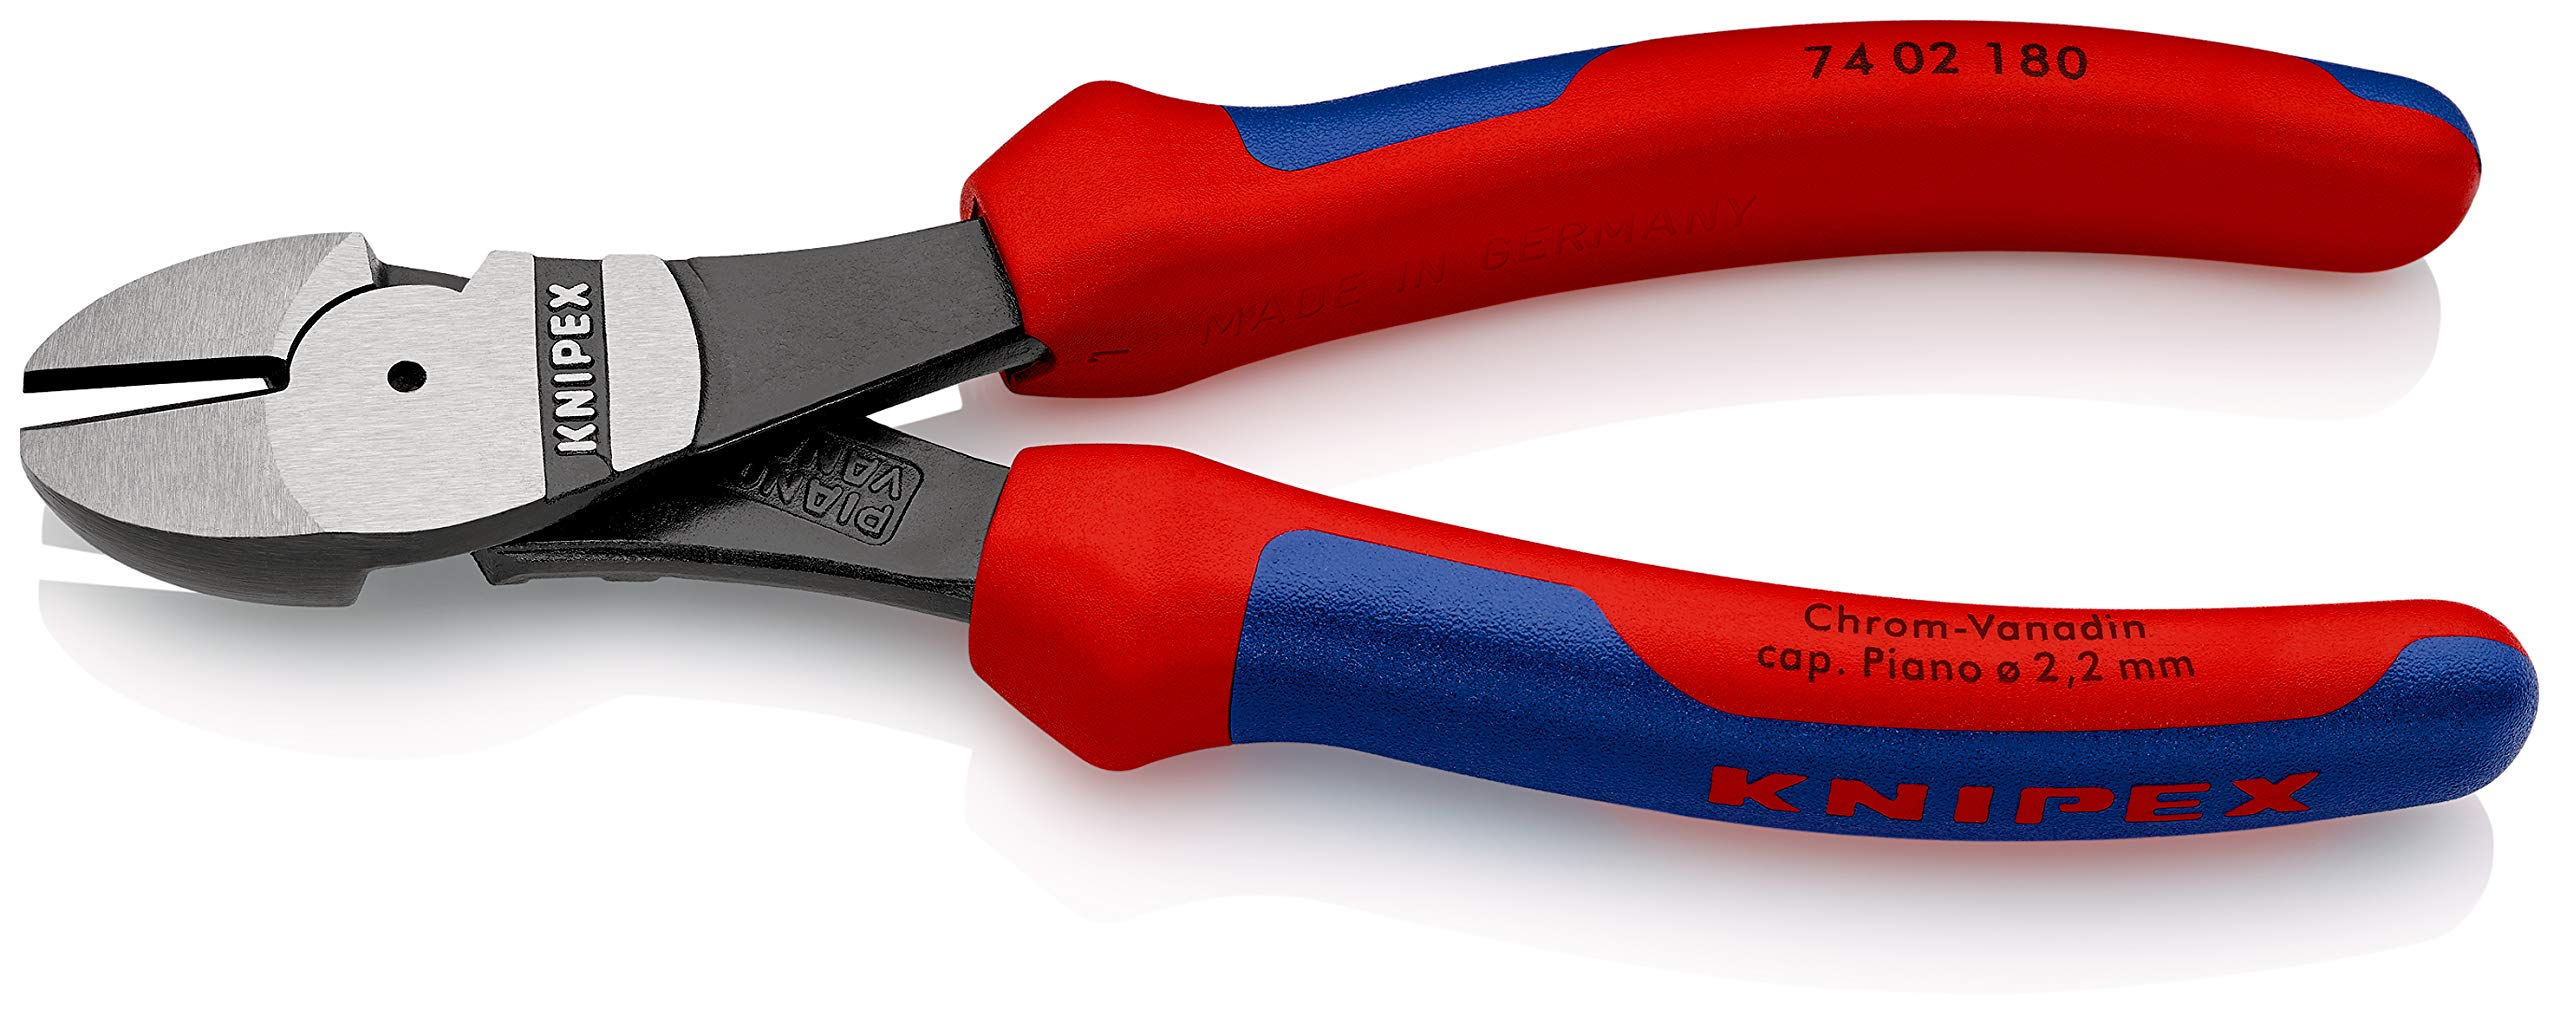 Non Concern/é Knipex 6801180SB Pince coupante devant 180mm